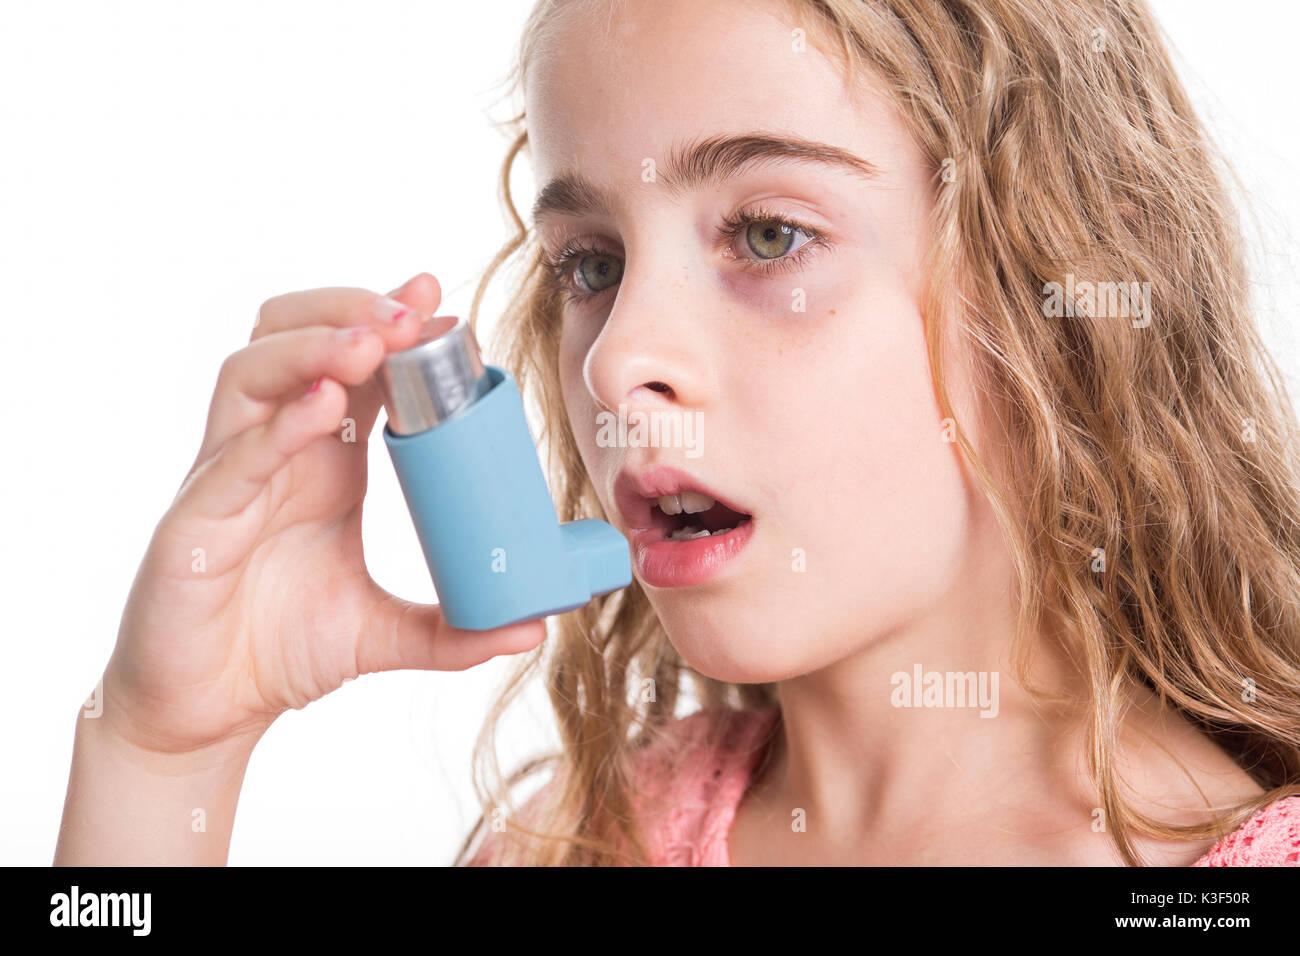 girl using bronchial inhaler stockfotos girl using bronchial inhaler bilder alamy. Black Bedroom Furniture Sets. Home Design Ideas